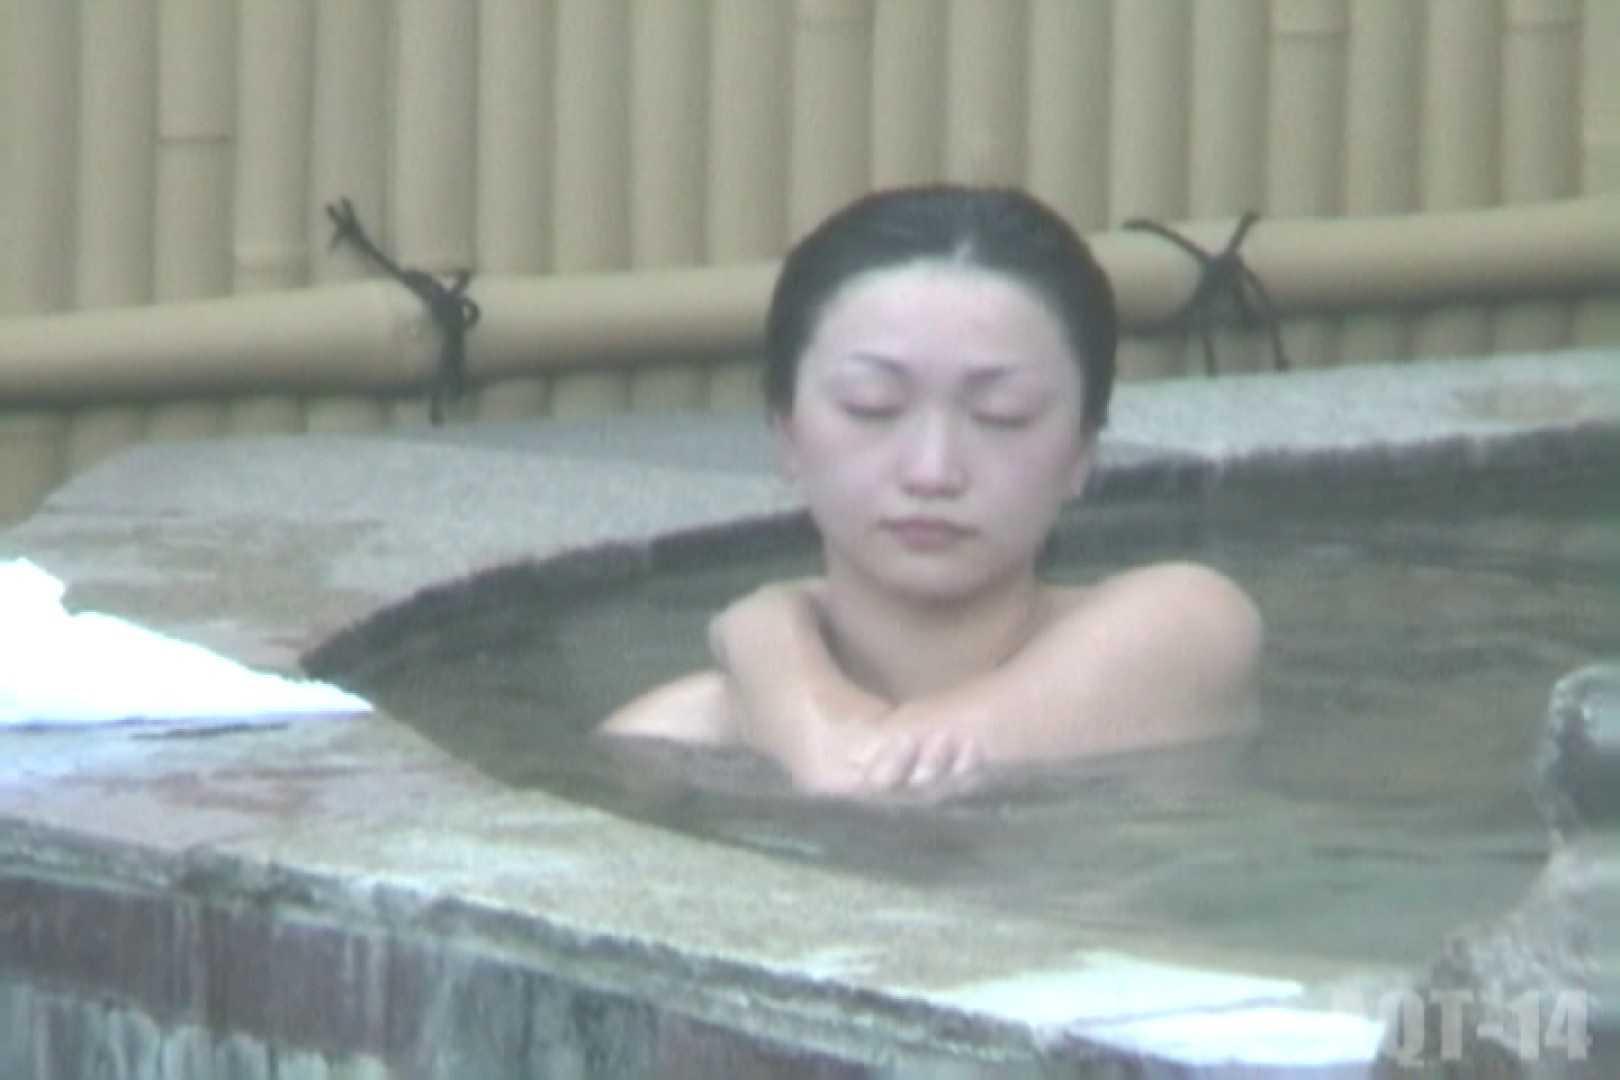 Aquaな露天風呂Vol.826 盗撮  84連発 42